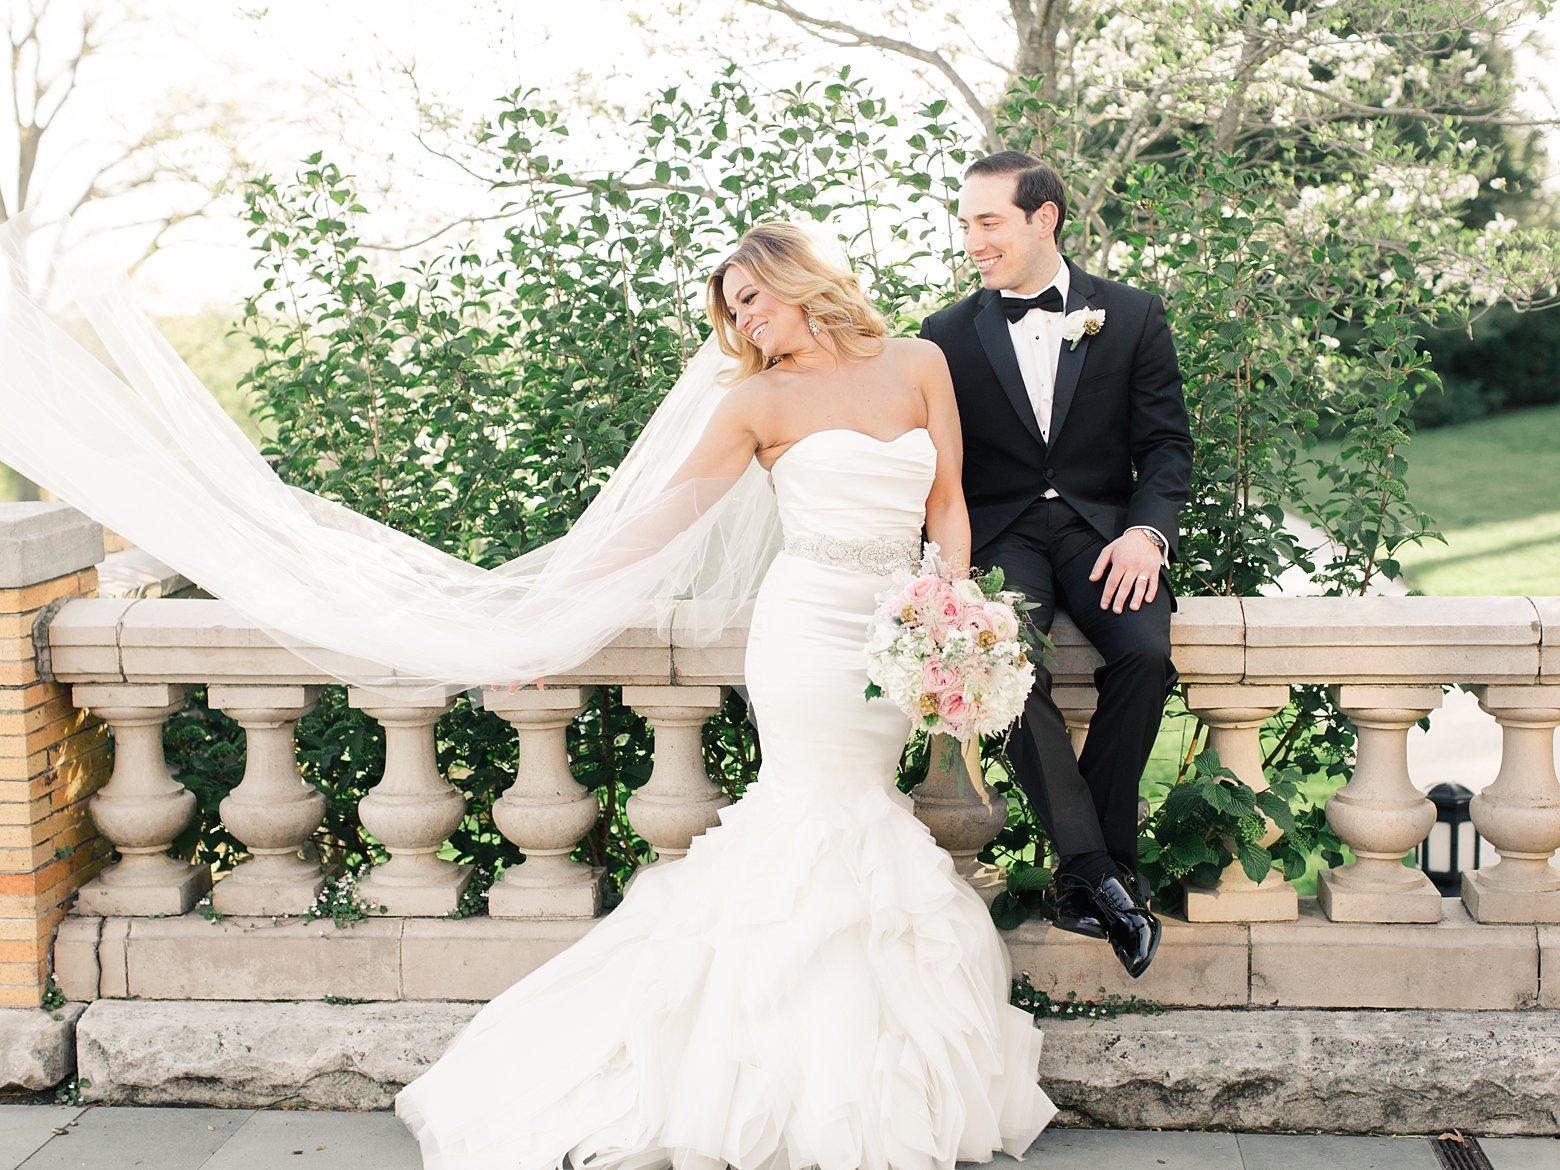 lauren_fair_photography_april_lynn_designs_stasia_matt_spring_cairnwood_estate_wedding_northeast_philadelphia_blush_pink_gold_wedding_invitation_stationery_0114